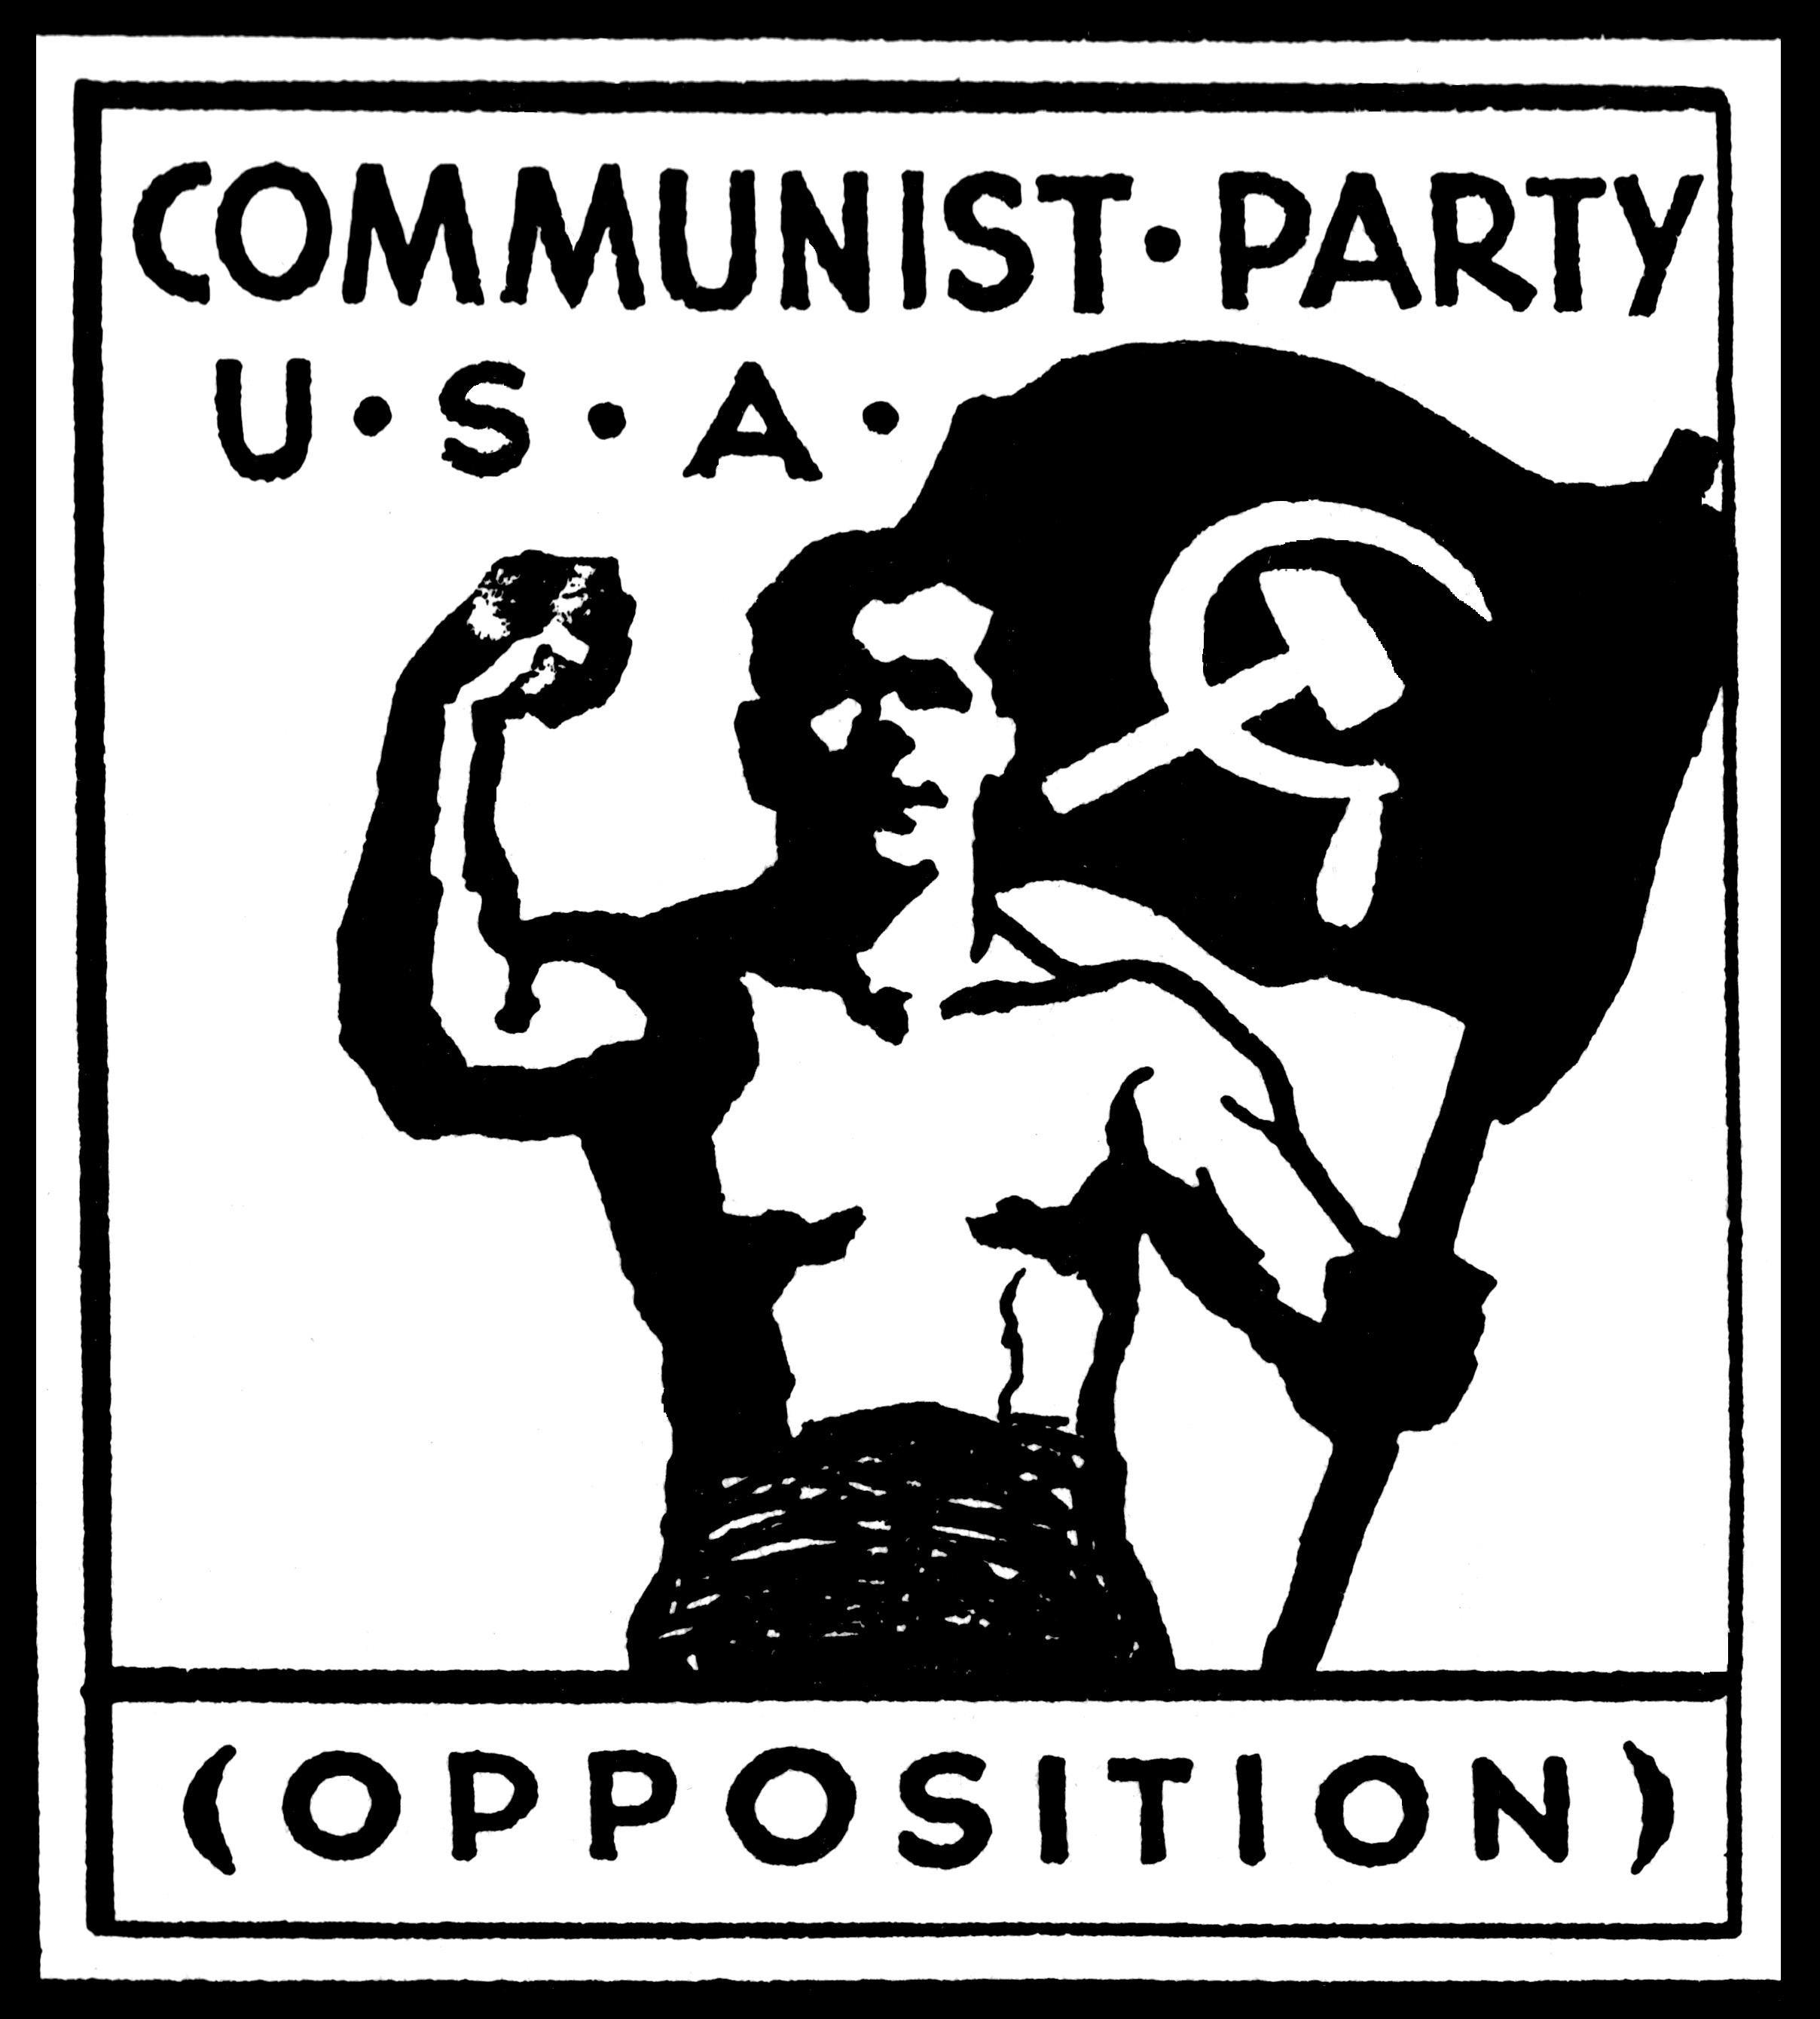 Communist party usa platform